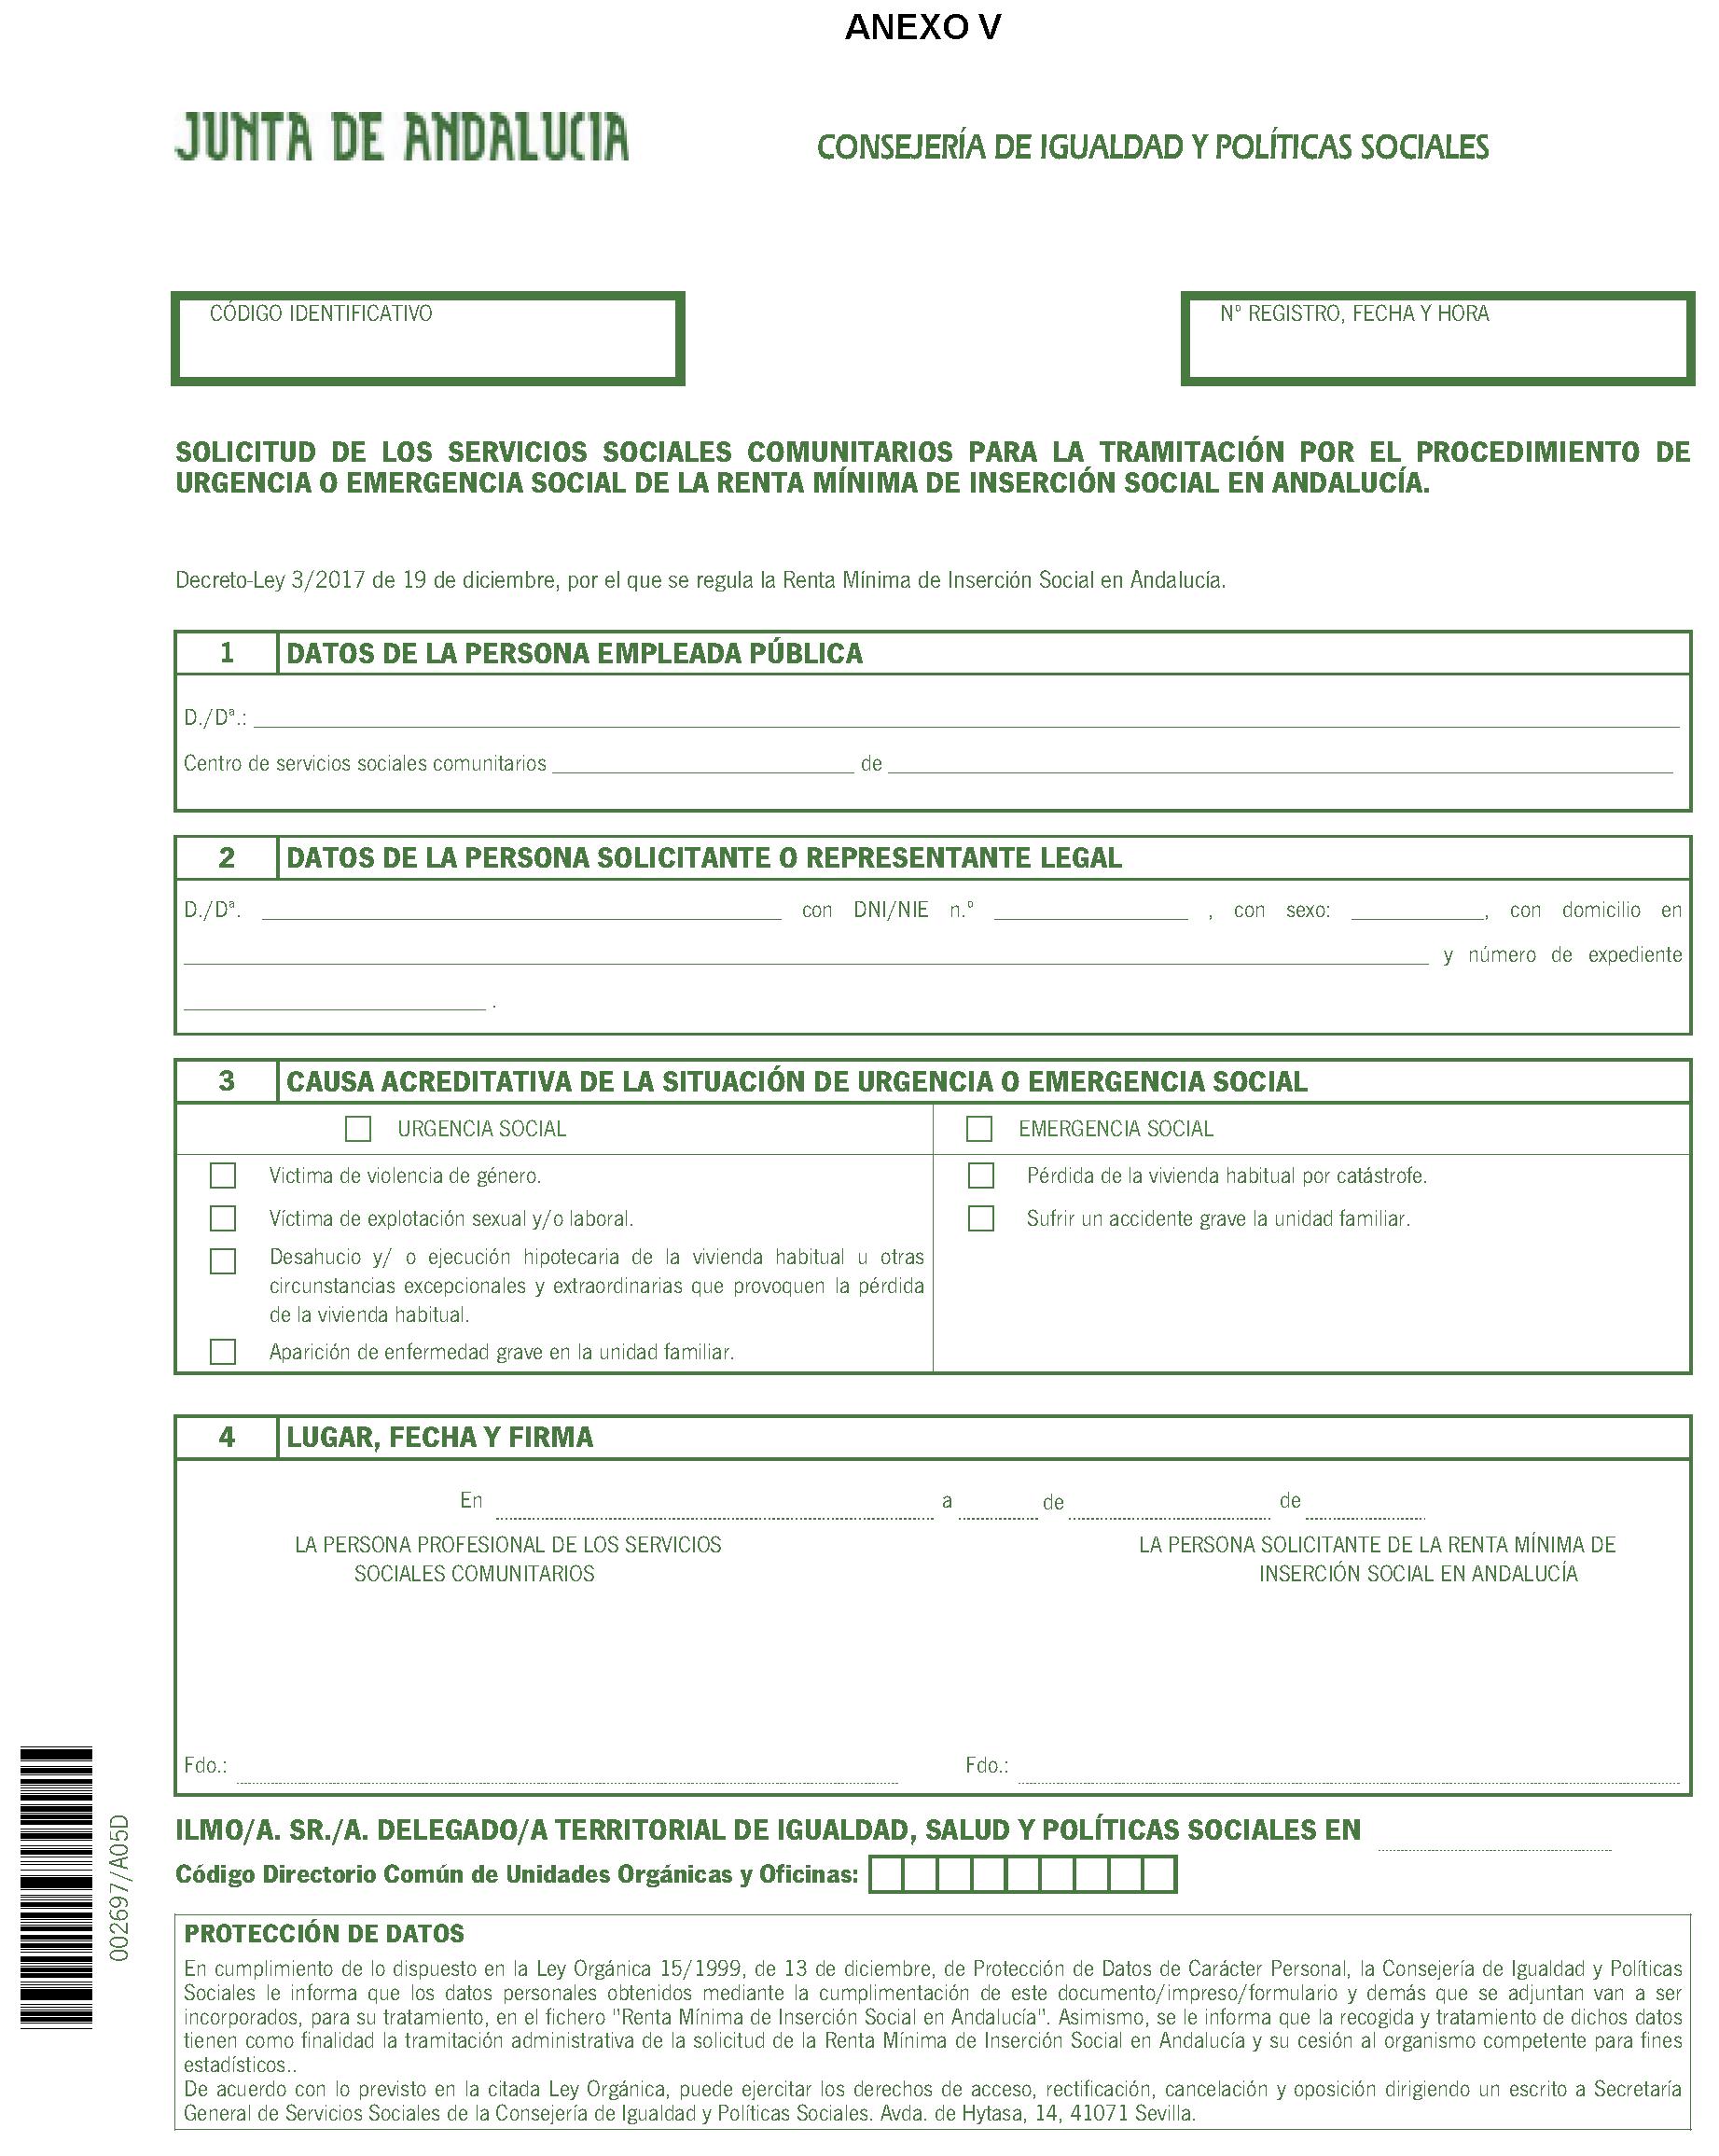 BOE.es - Documento BOJA-b-2017-90529